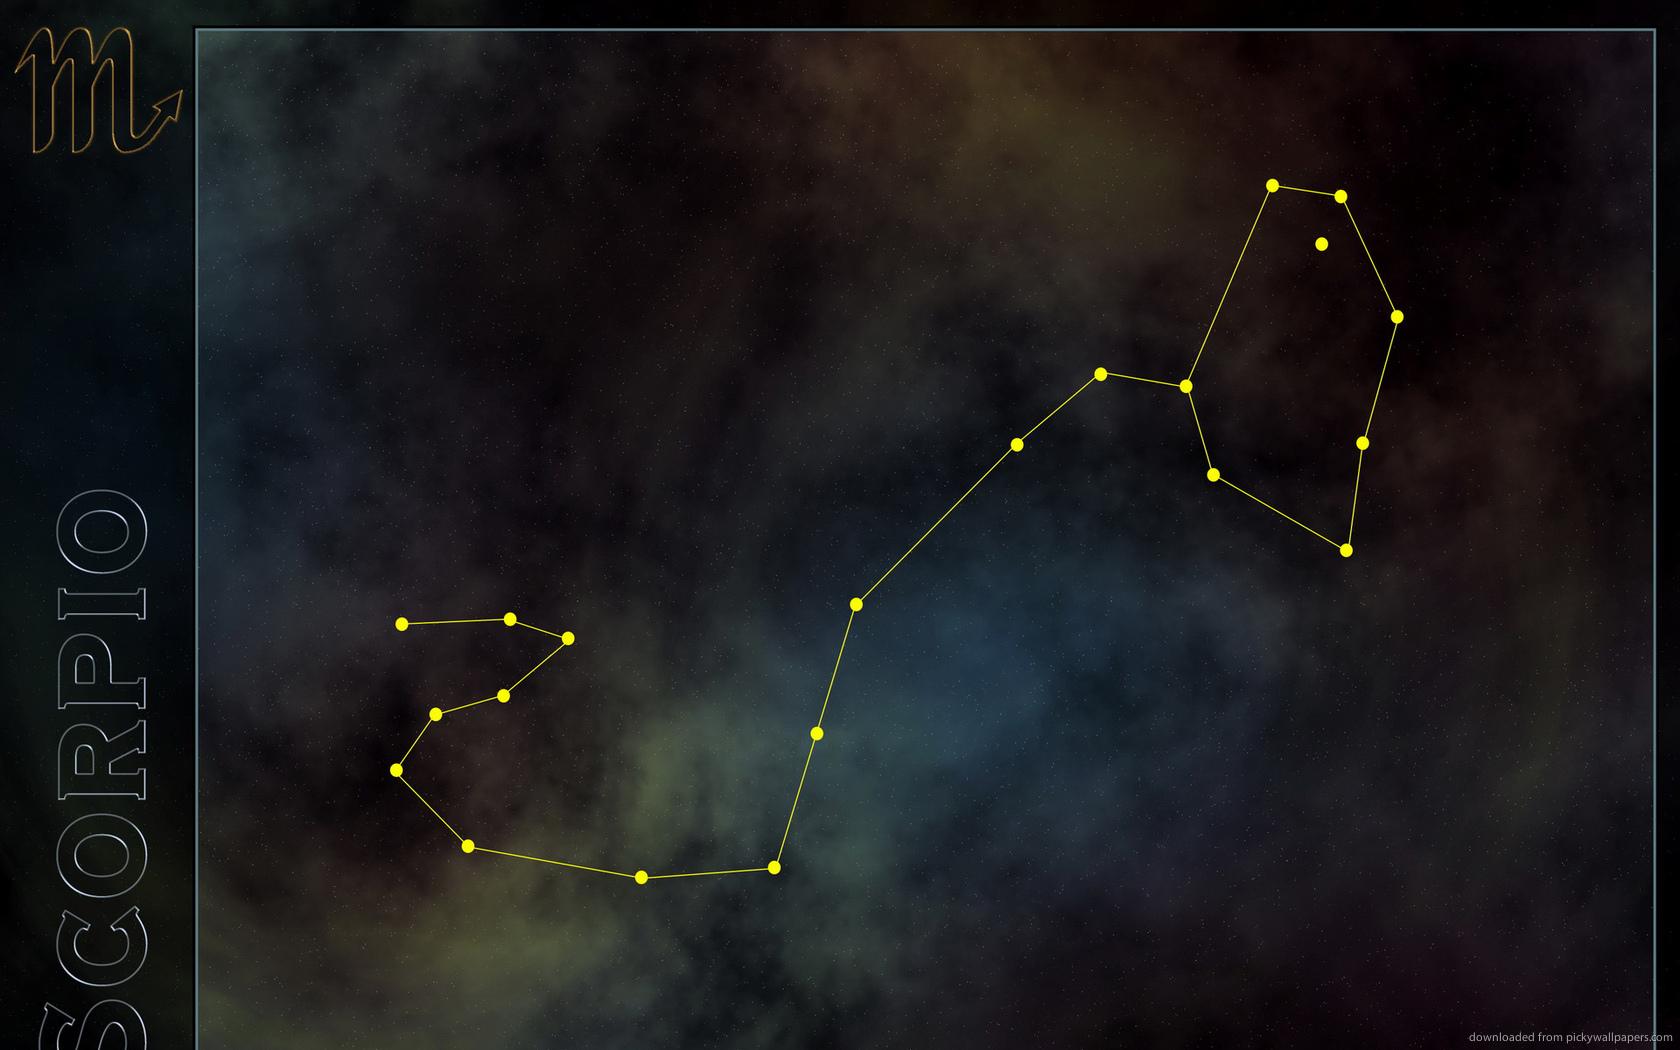 Download 1680x1050 Scorpio Constellation Wallpaper 1680x1050